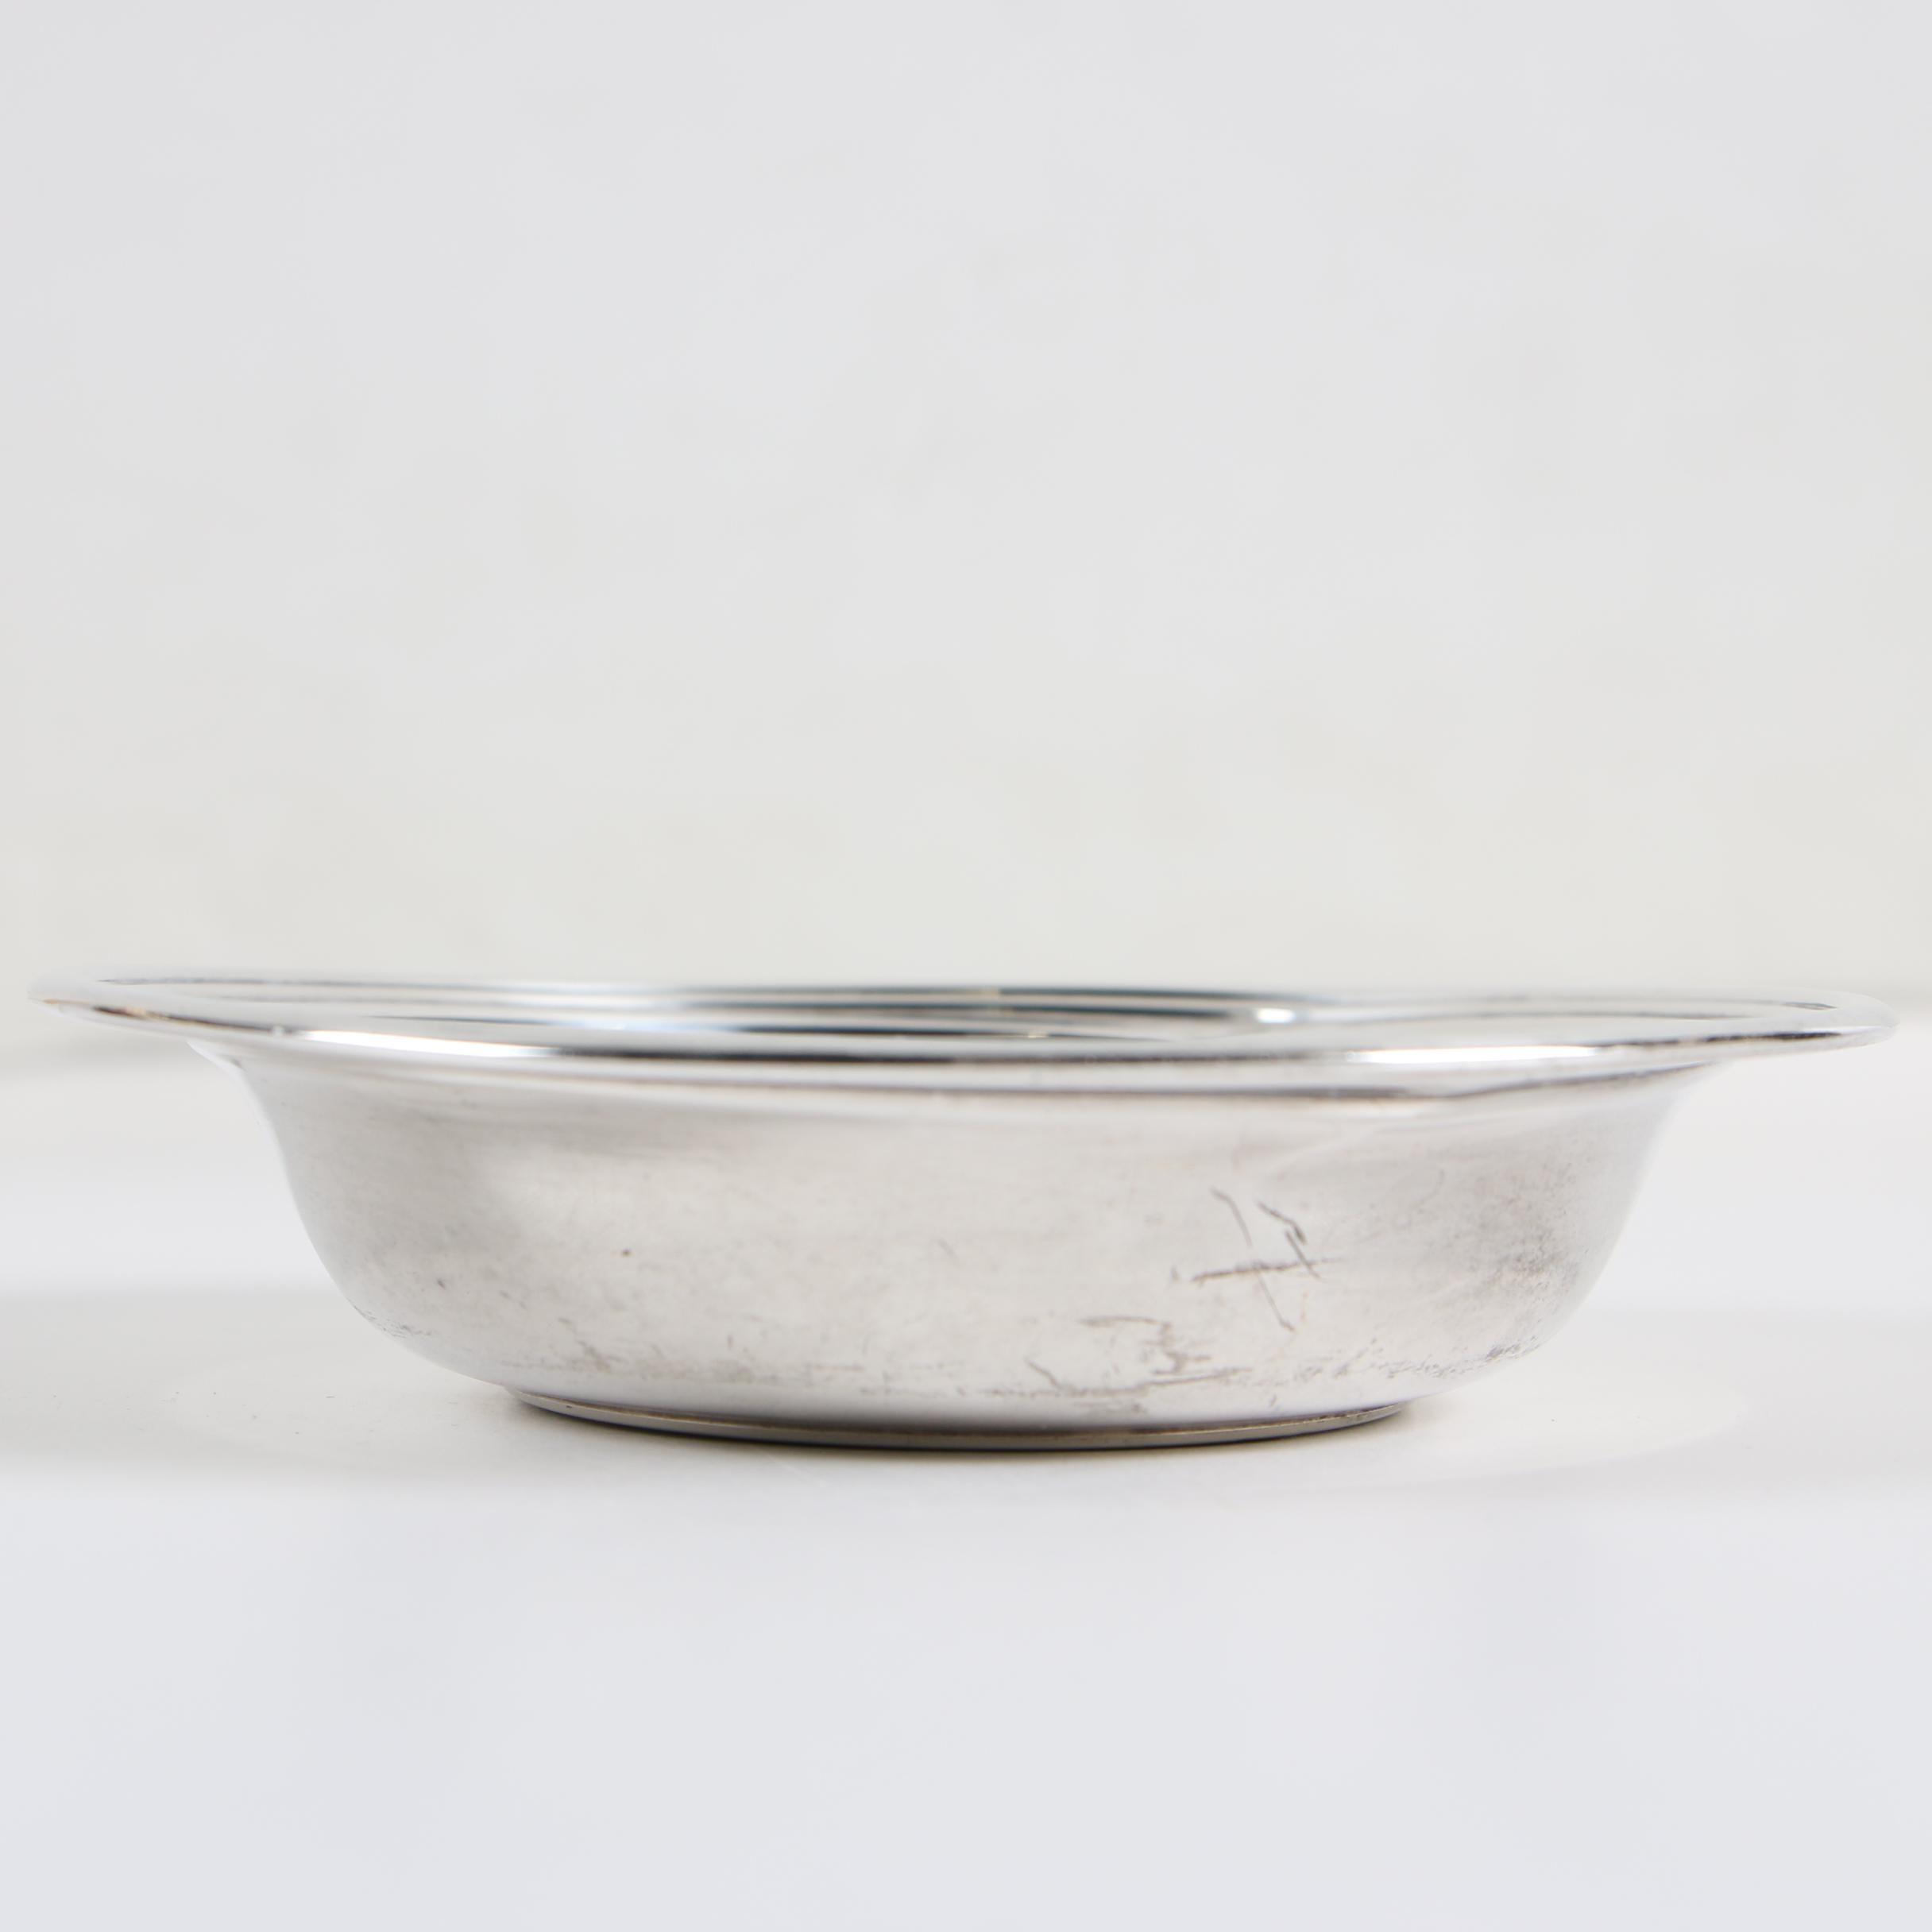 Randahl Sterling Silver Bon Bon Bowl Retailed by Charles S. Stifft, Mid-Century